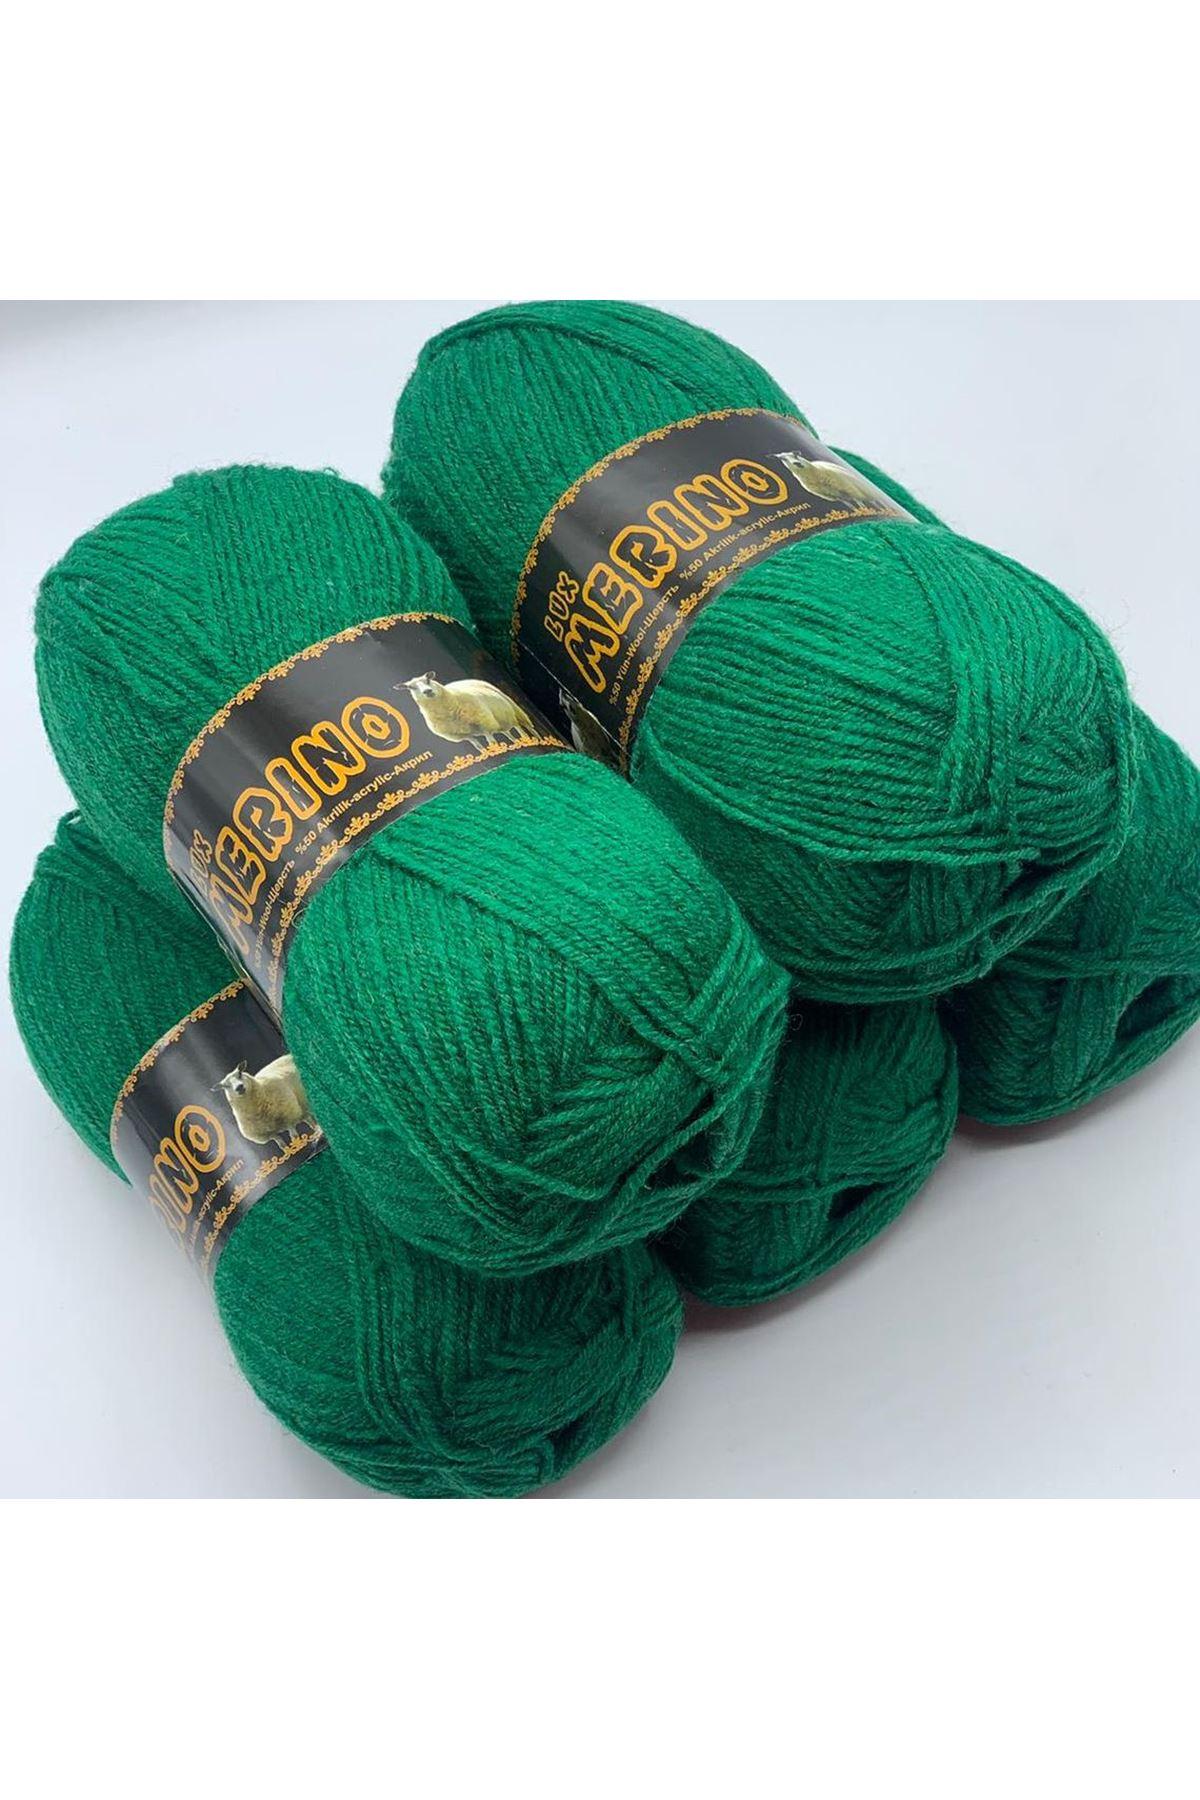 İhrac Fazlası 5'li Paket 1162 %50 Merino Koyu Yeşil